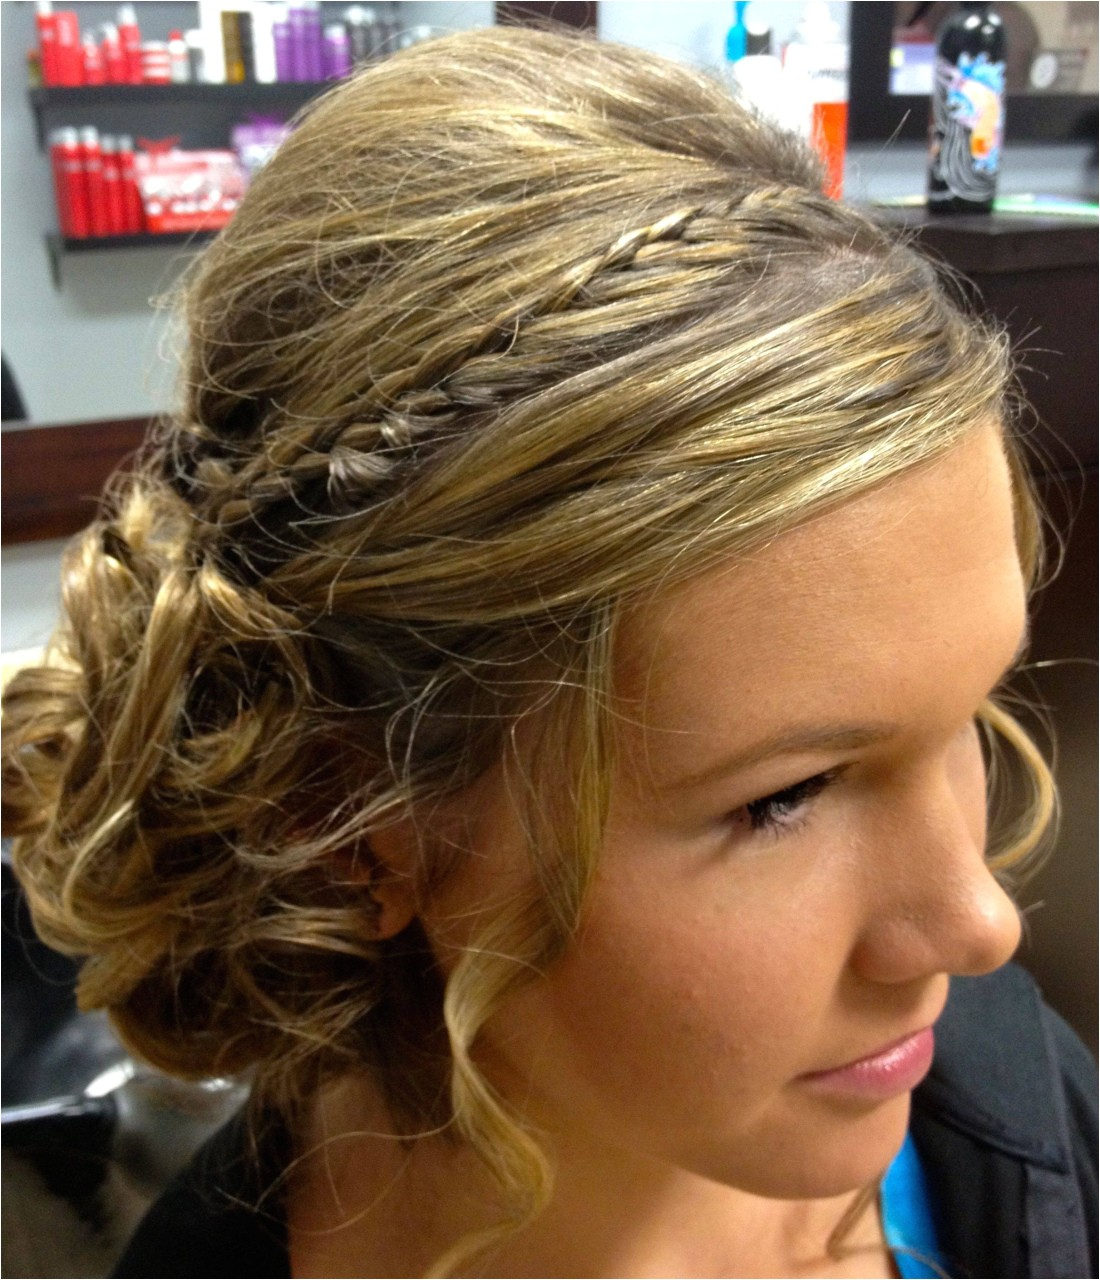 Hairstyles Cutting for Girls 99 Picture Hairstyles Luxury Hair Salon Meilleur Hair Salon